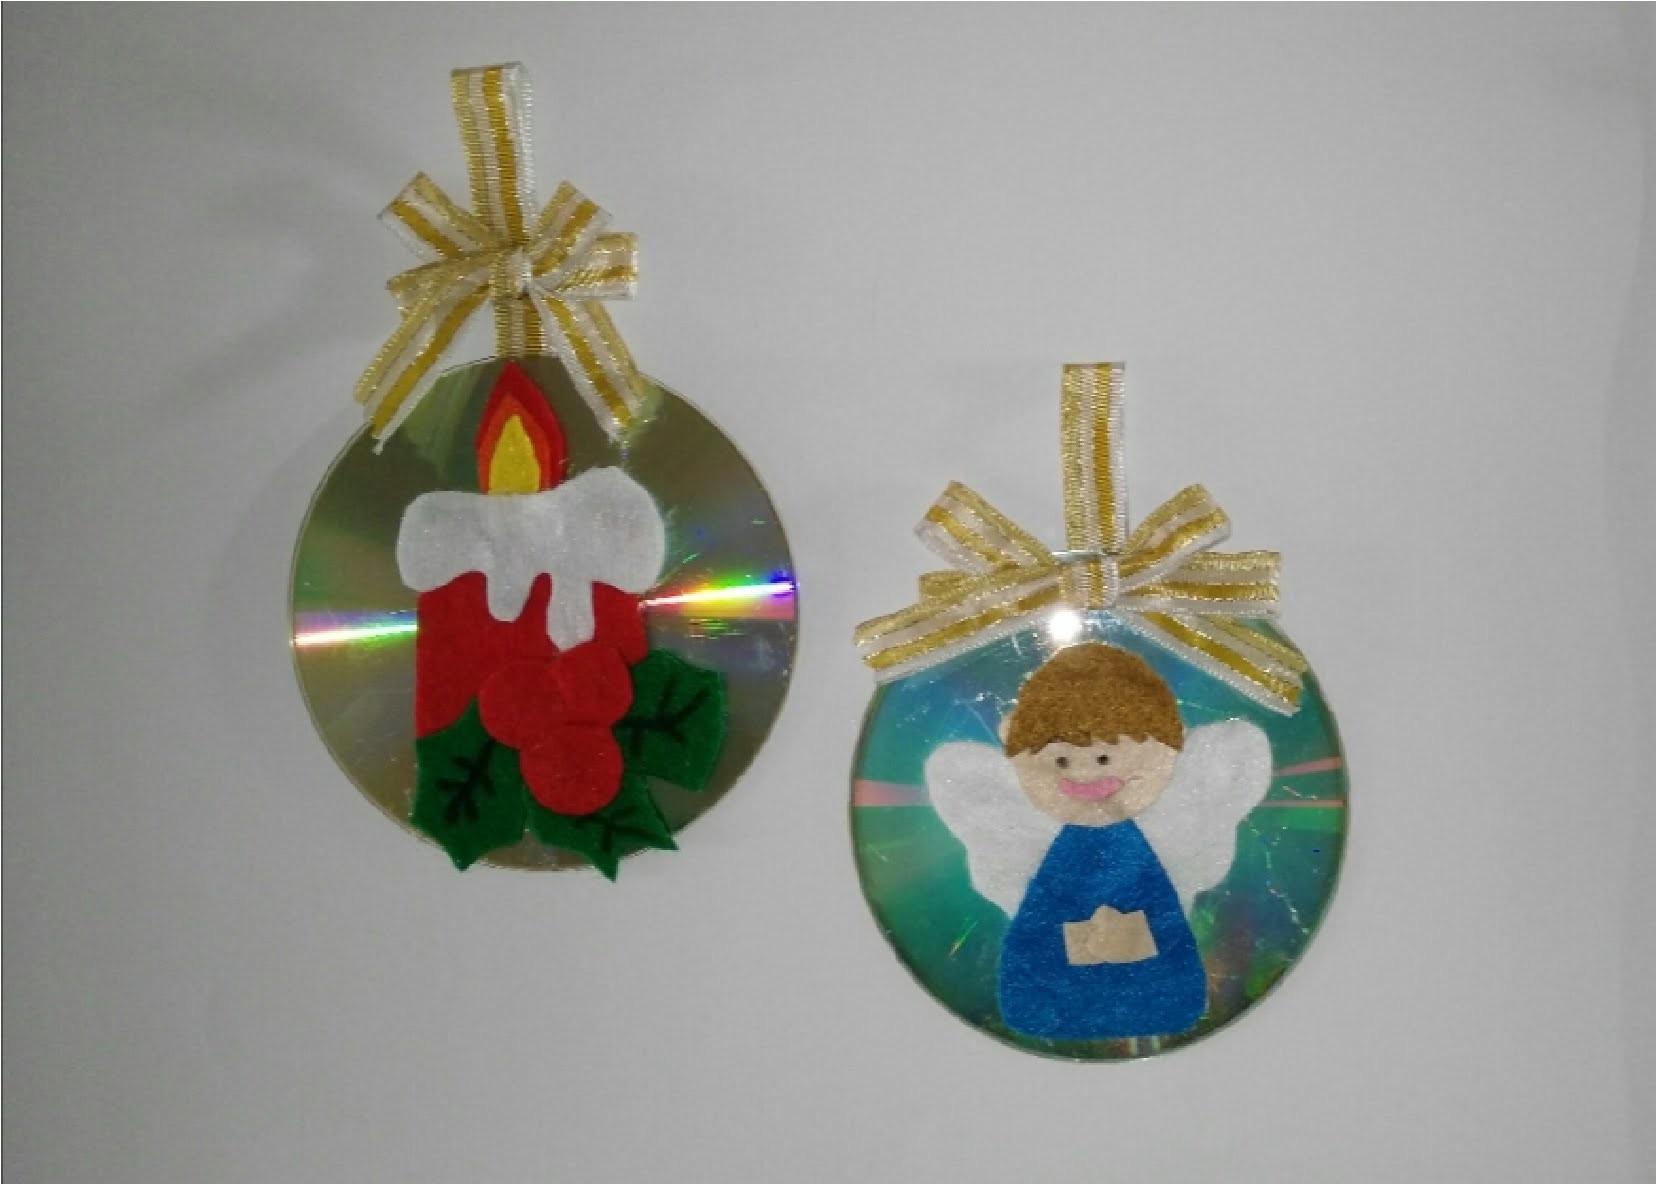 como hacer adornos navide os con cd para el arbol de On crear adornos navidenos